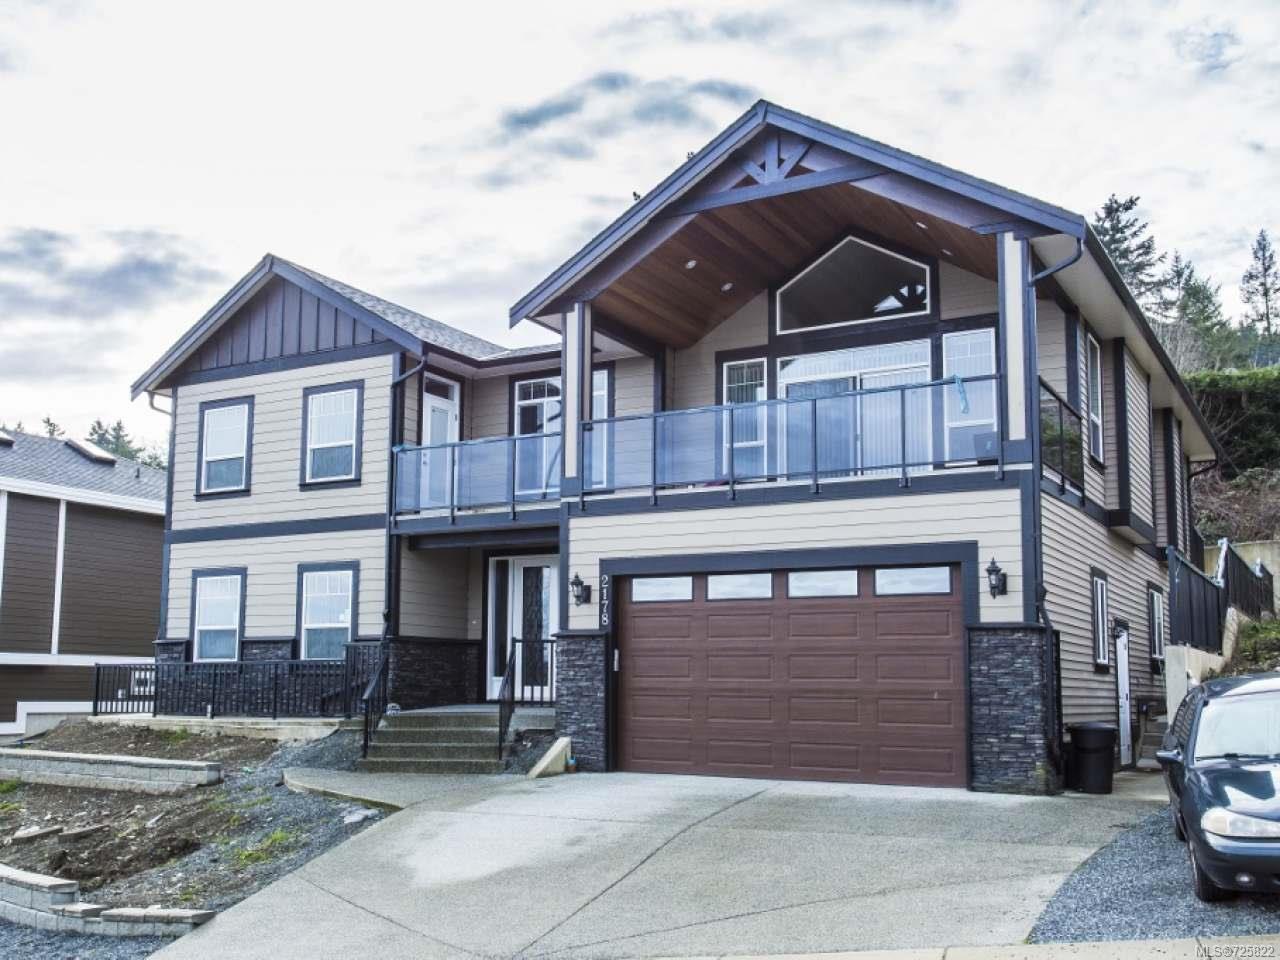 Main Photo: 2178 Elena Rd in NANAIMO: Na South Jingle Pot House for sale (Nanaimo)  : MLS®# 725822